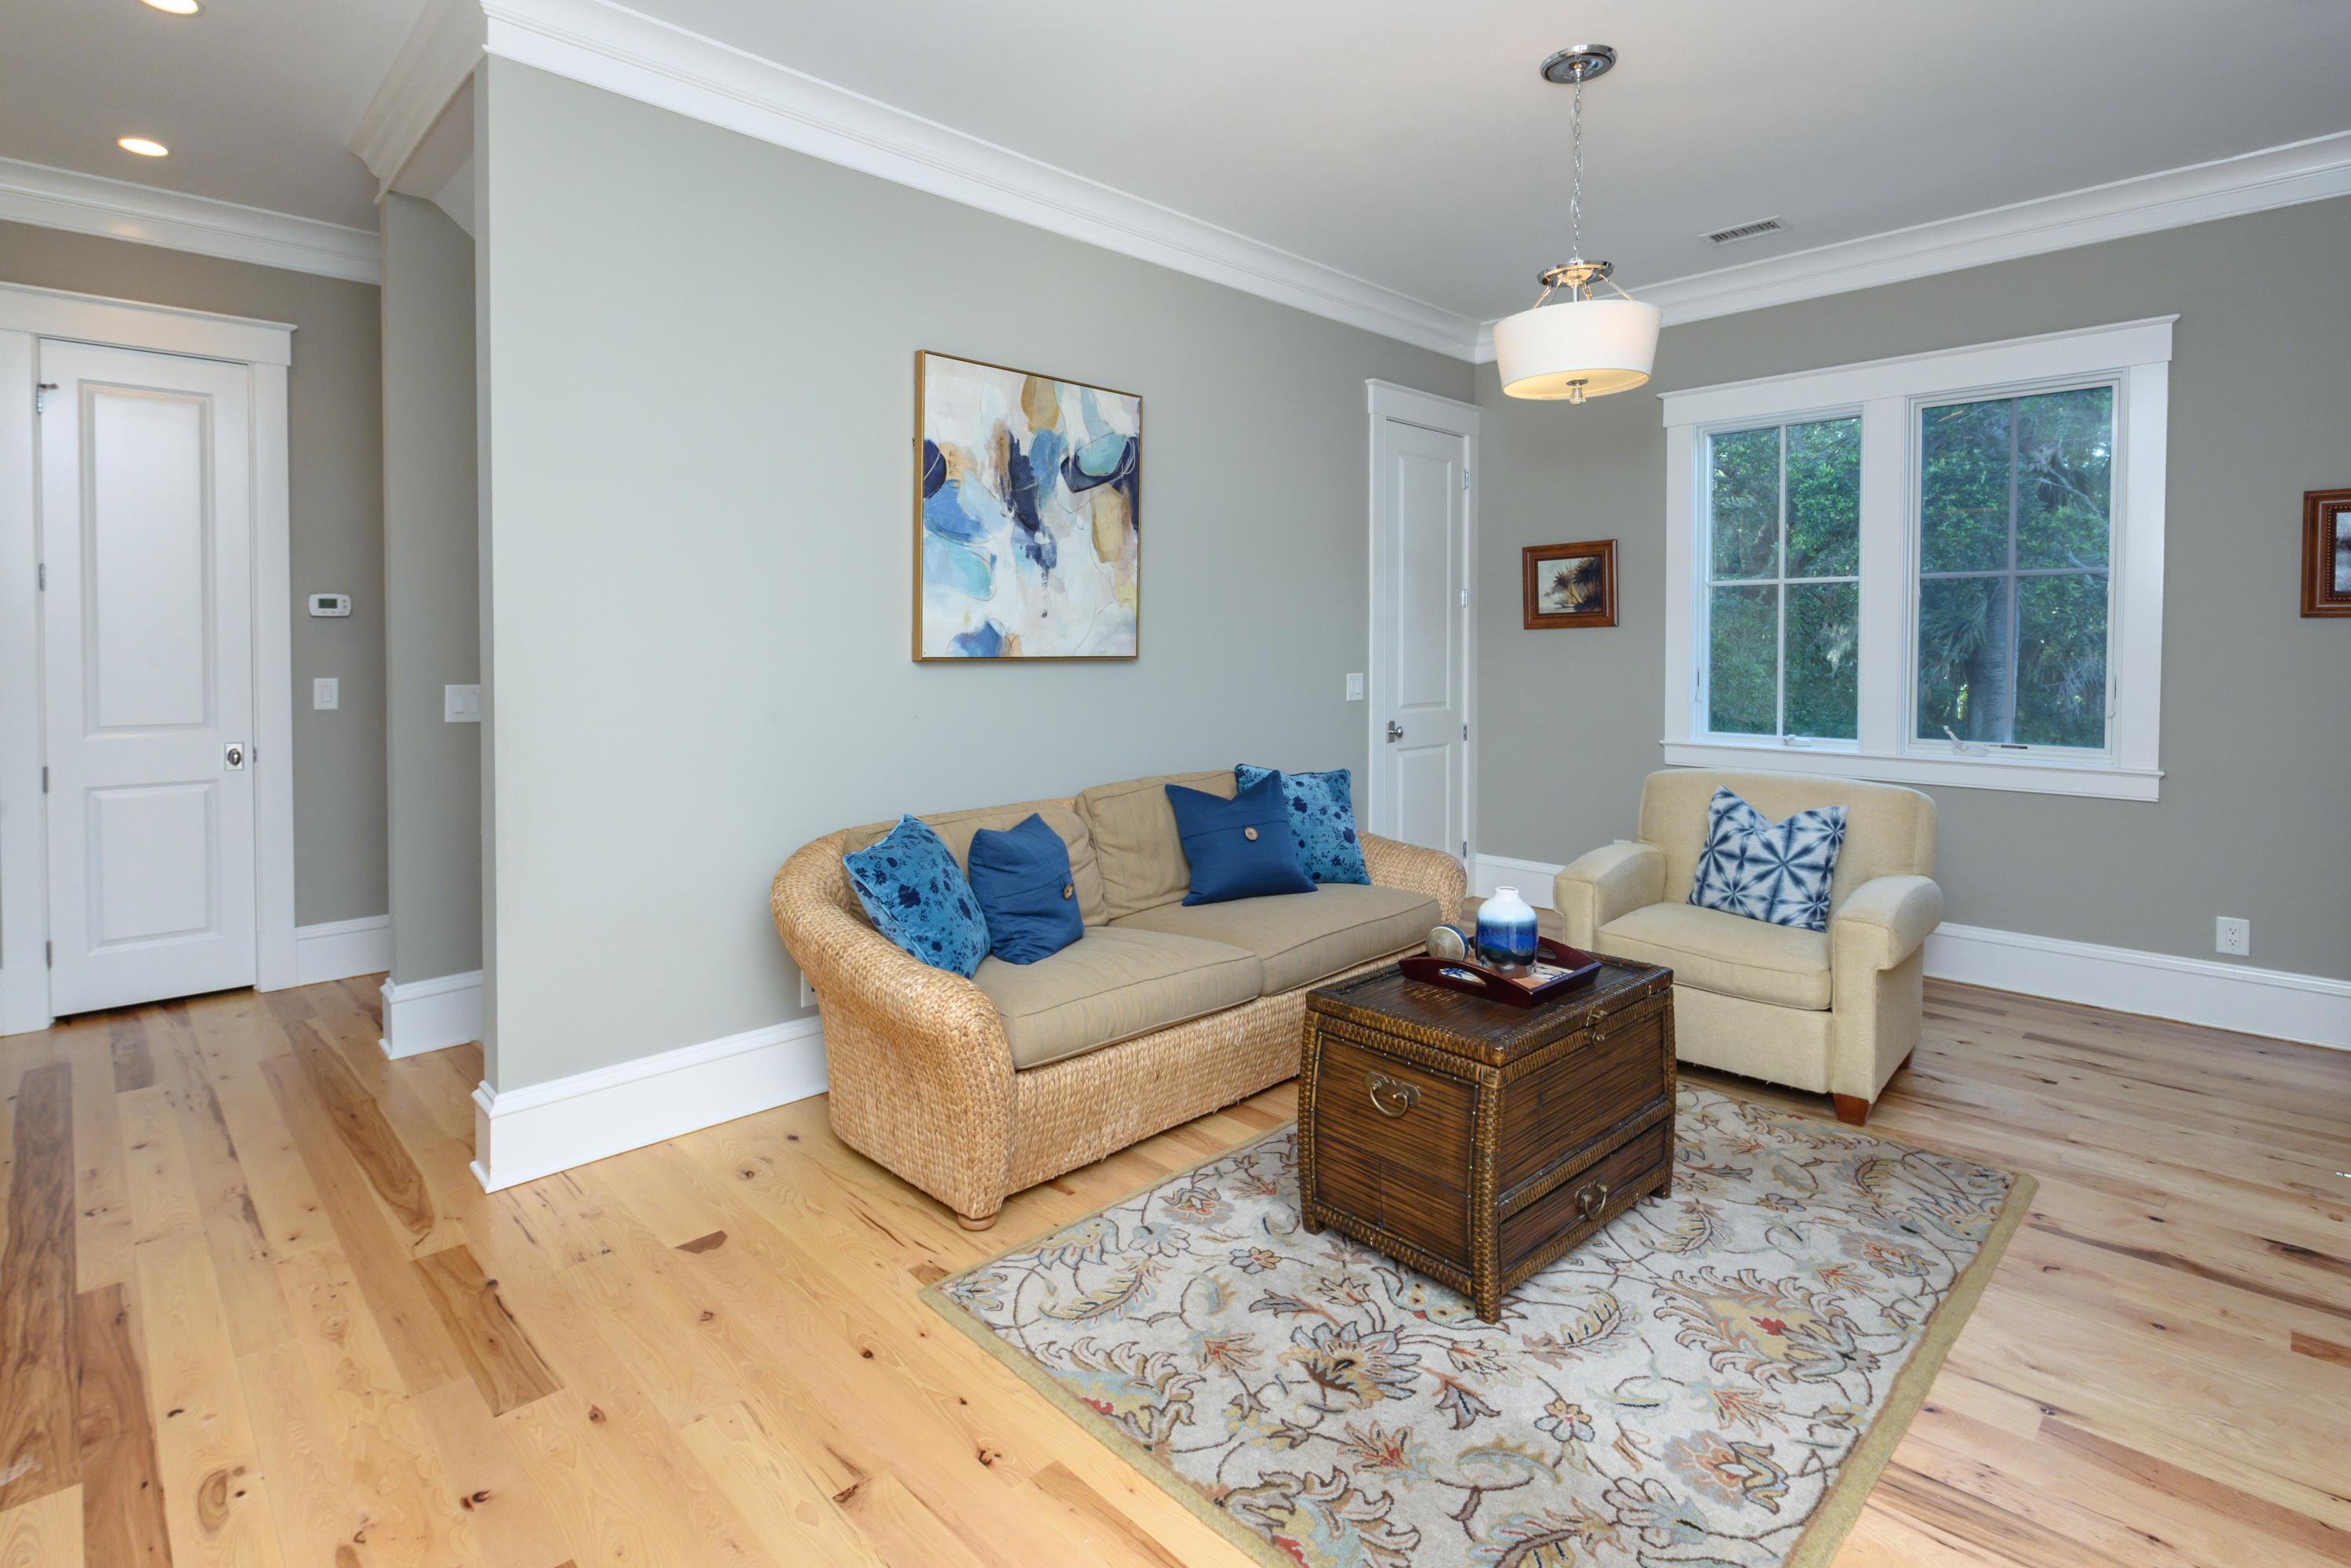 Kiawah Island Homes For Sale - 21 Bufflehead, Kiawah Island, SC - 59